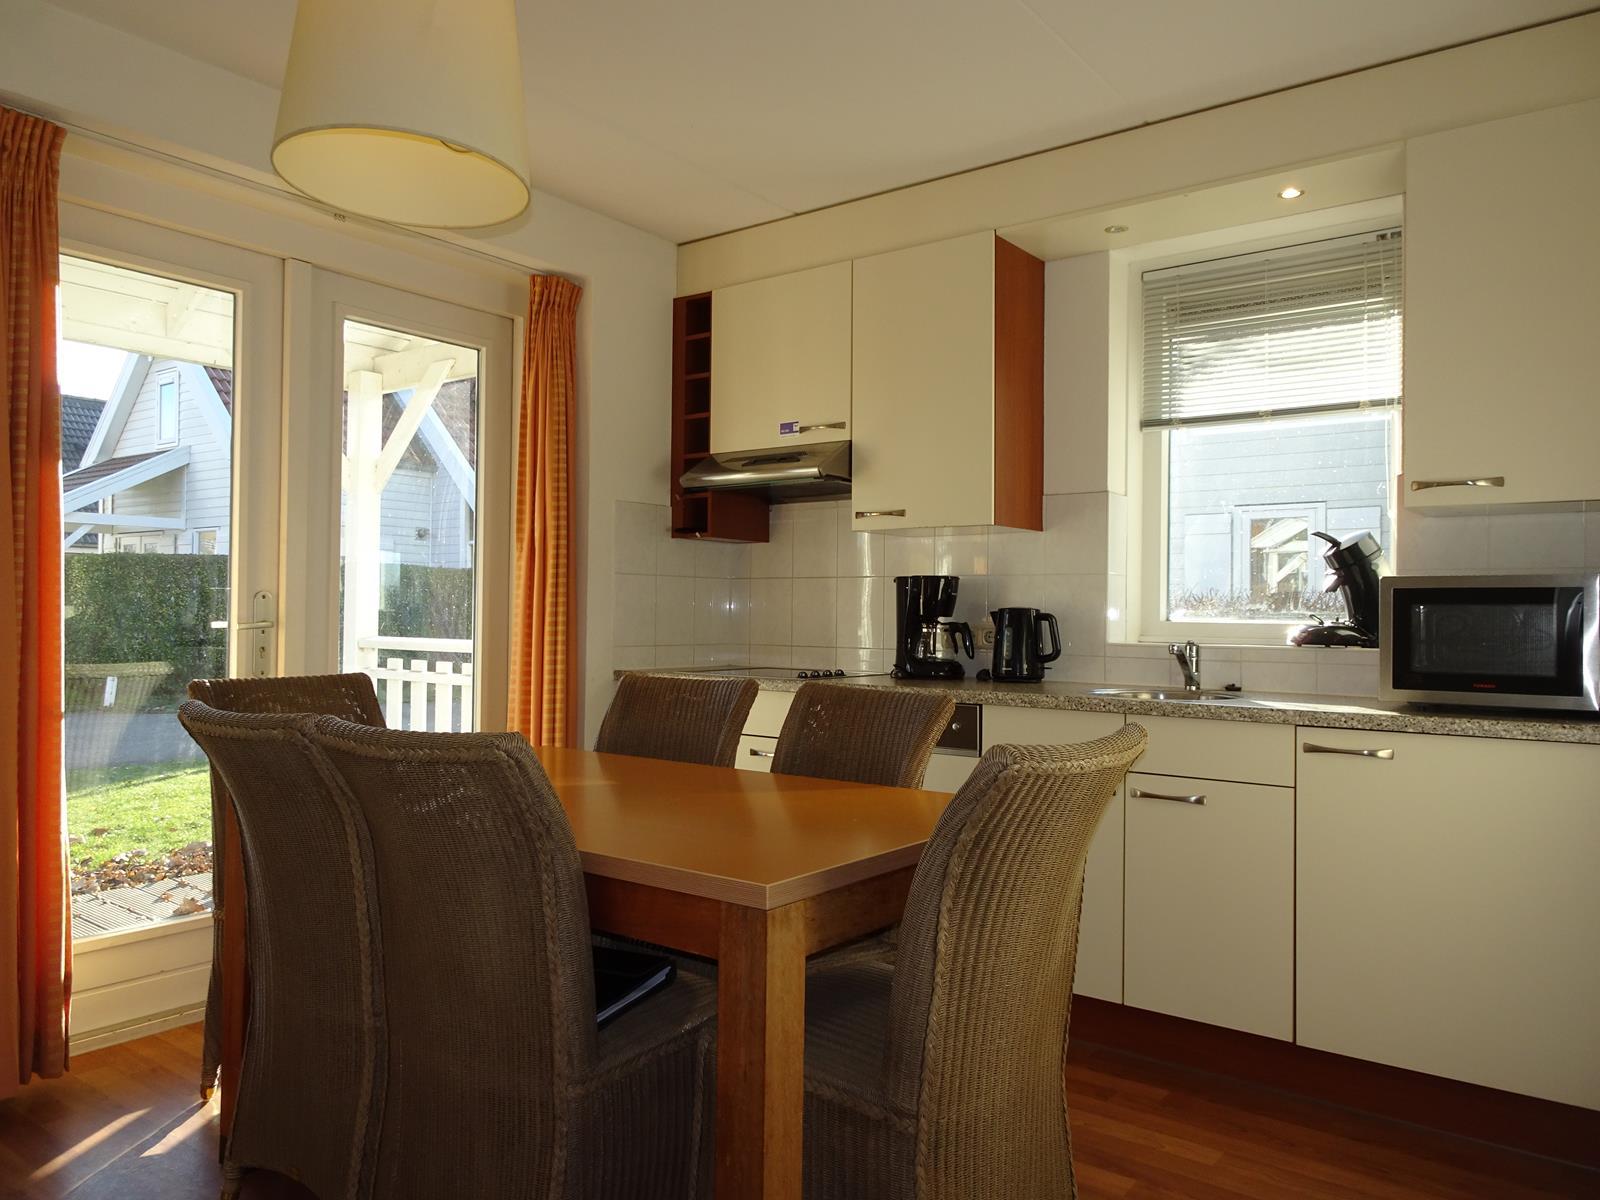 Vakantiehuis te koop Zeeland Bruinisse K155 (8).jpg